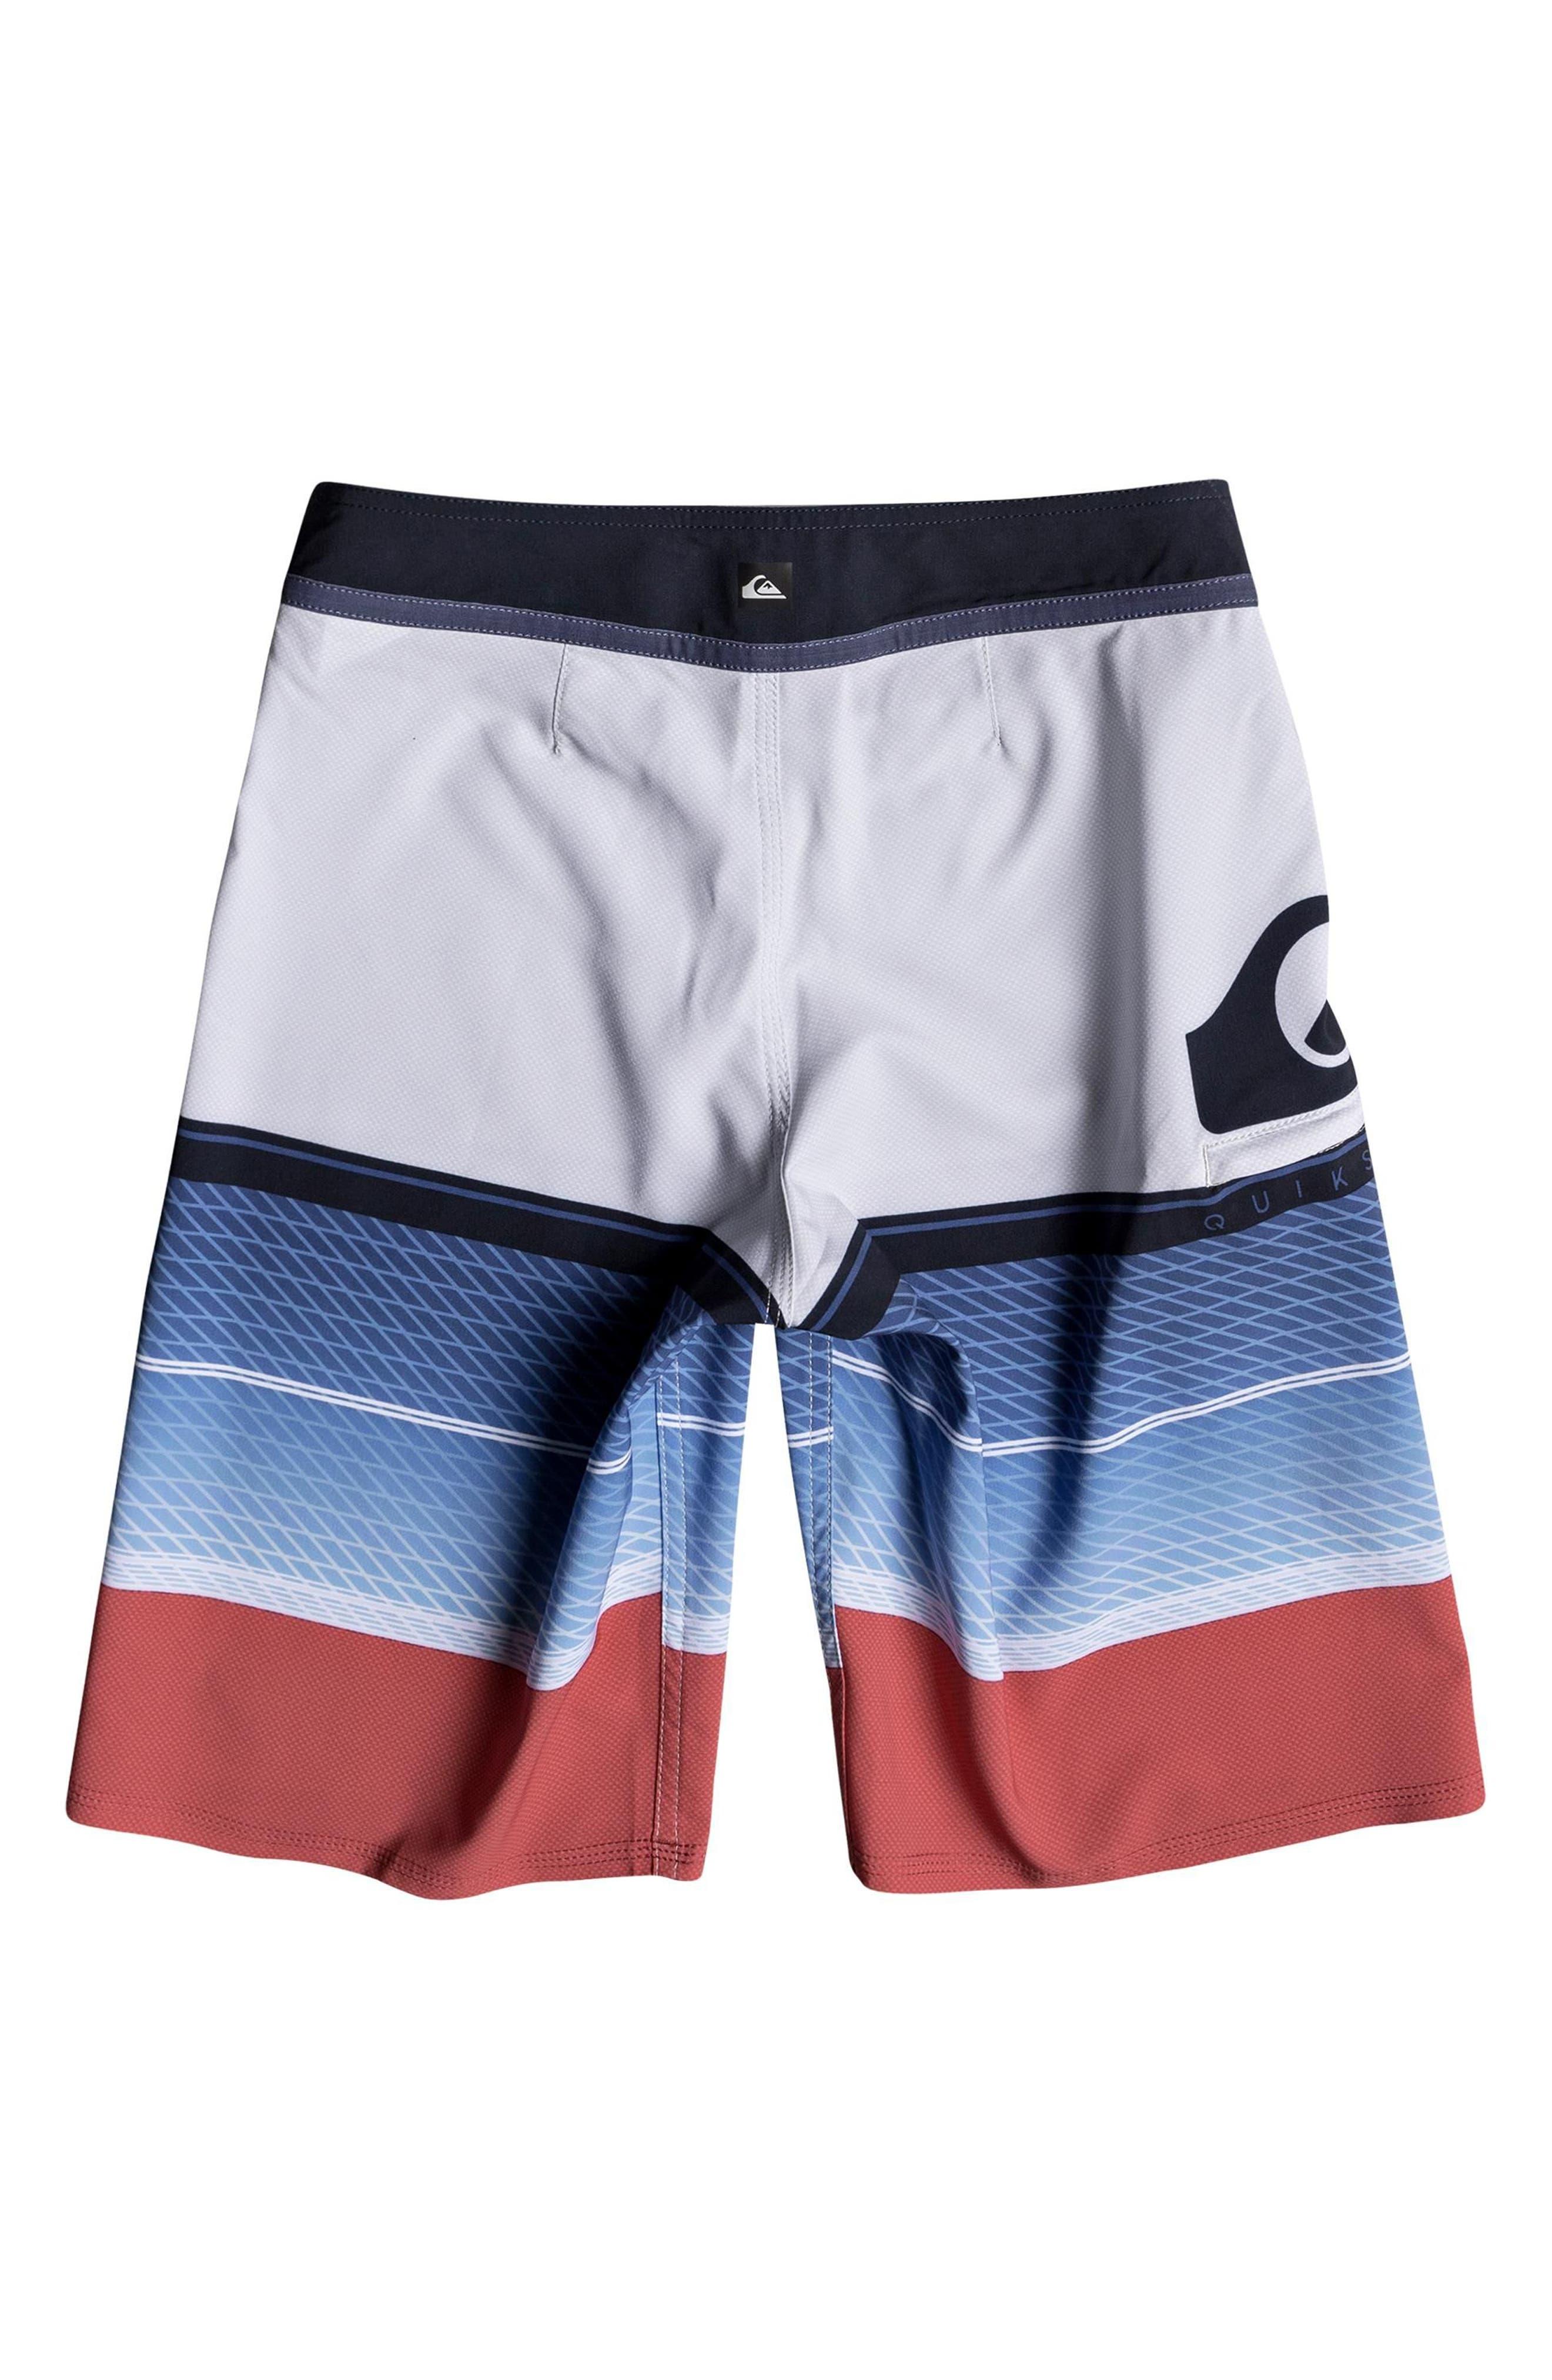 Highline Slab Board Shorts,                             Alternate thumbnail 3, color,